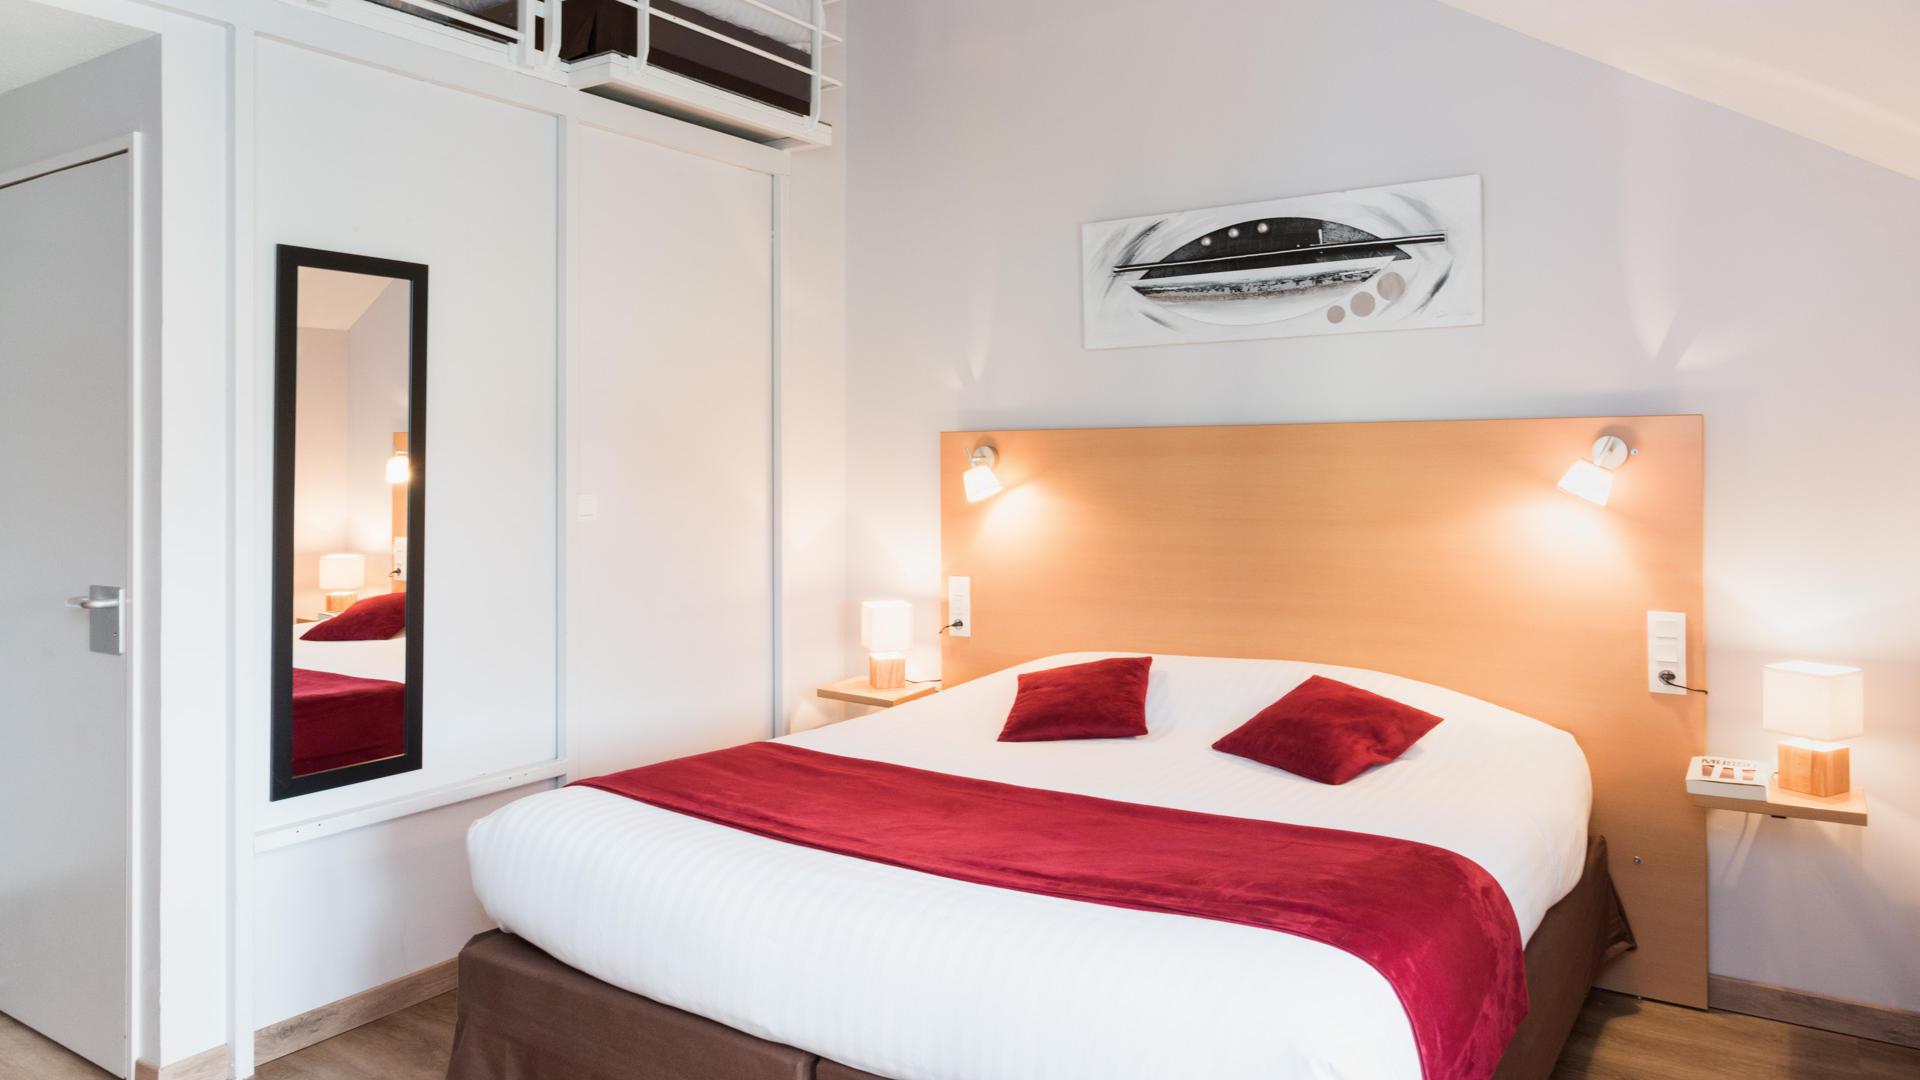 A Carré Py' Hôtel room.